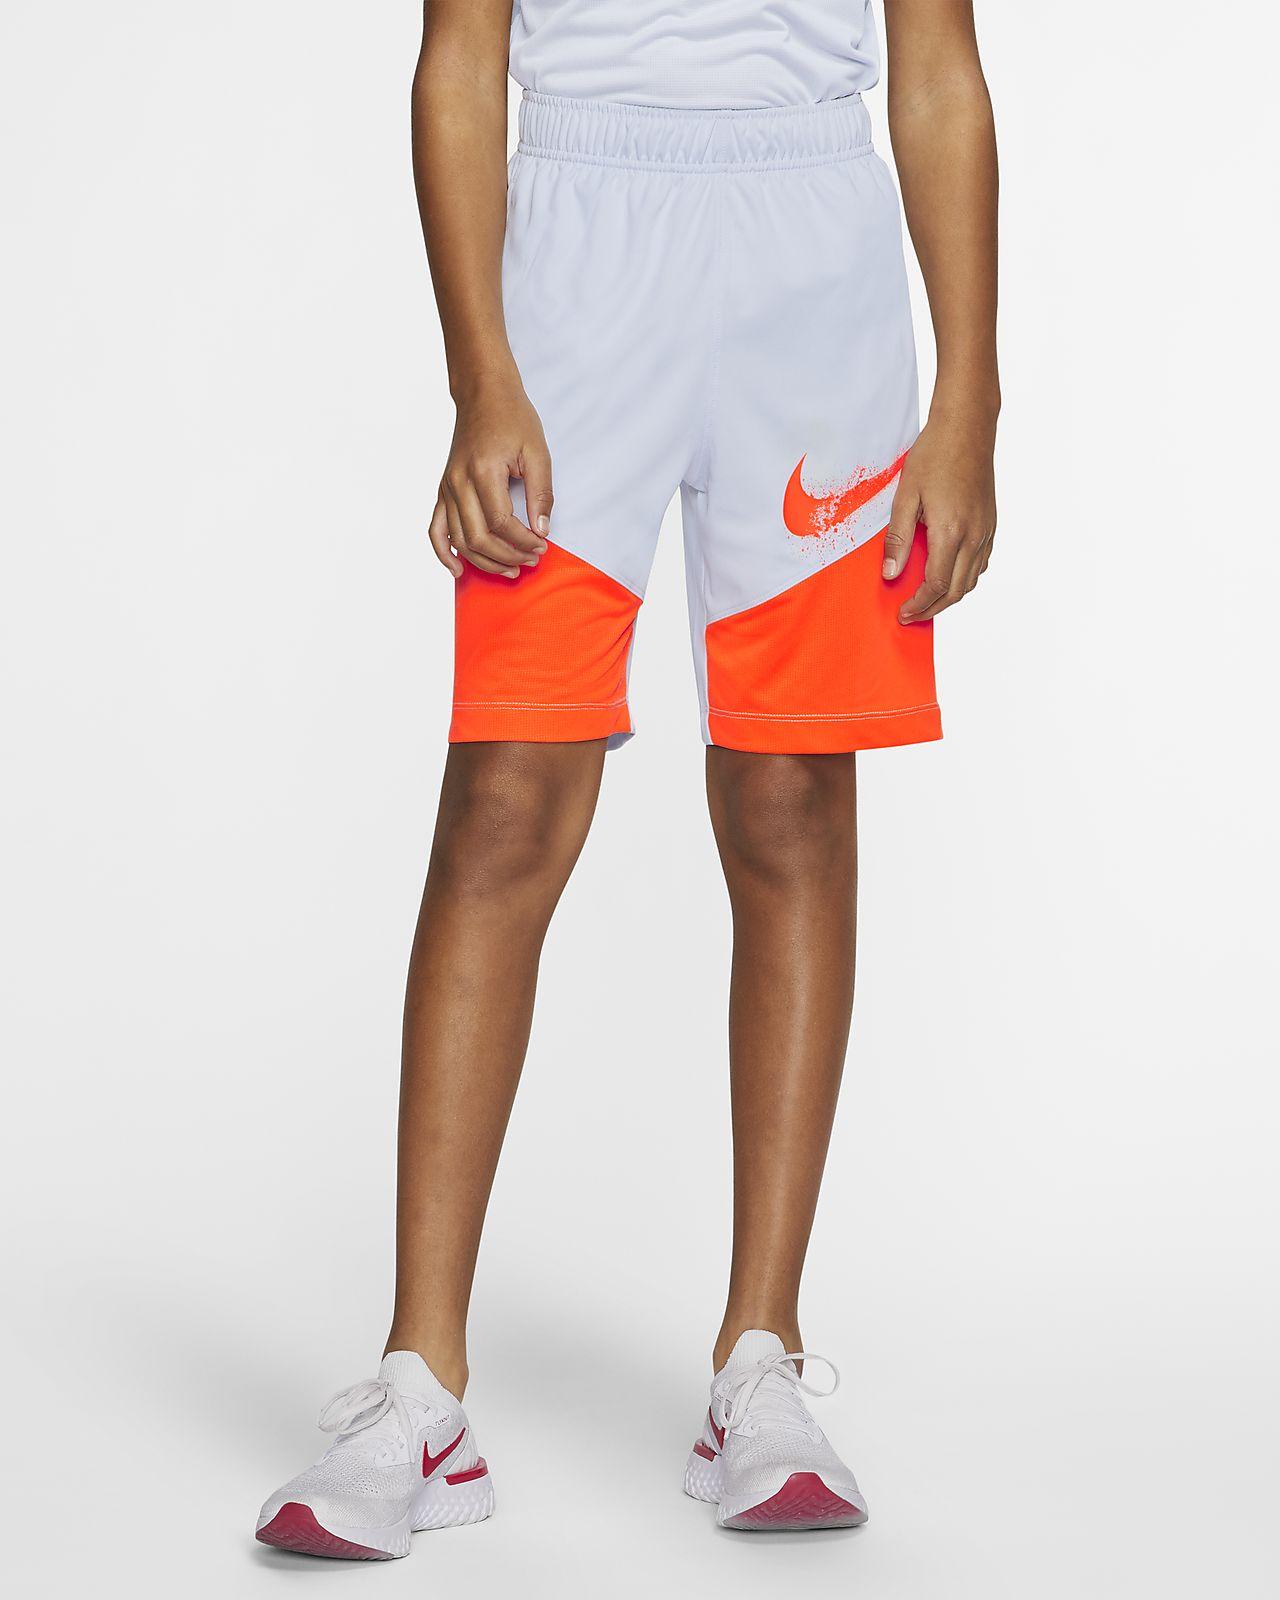 Nike Big Kids' (Boys') Graphic Training Shorts